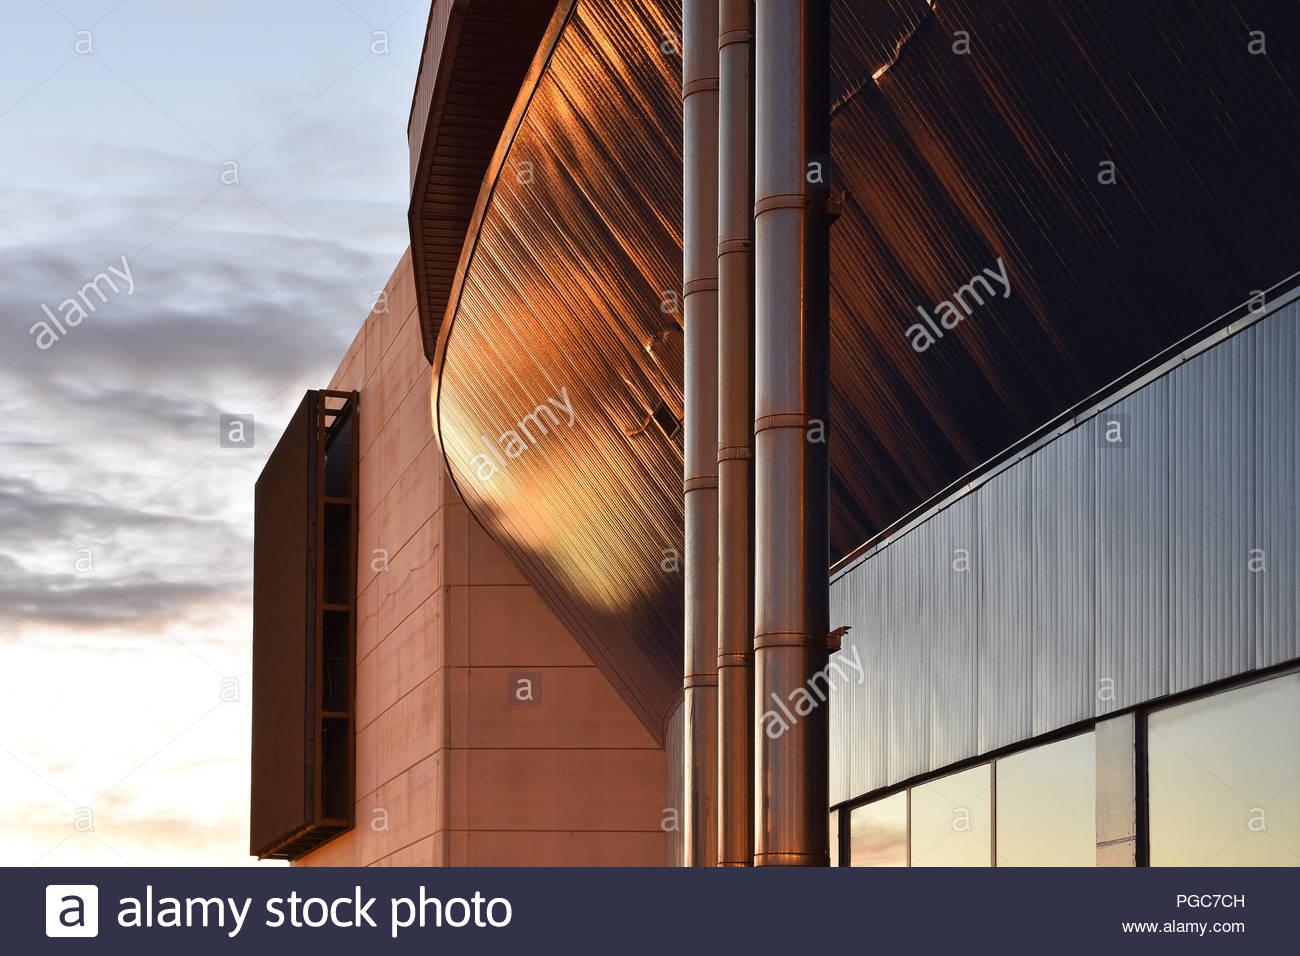 Metall Verkleidete Fassade Stockfotos Metall Verkleidete Fassade